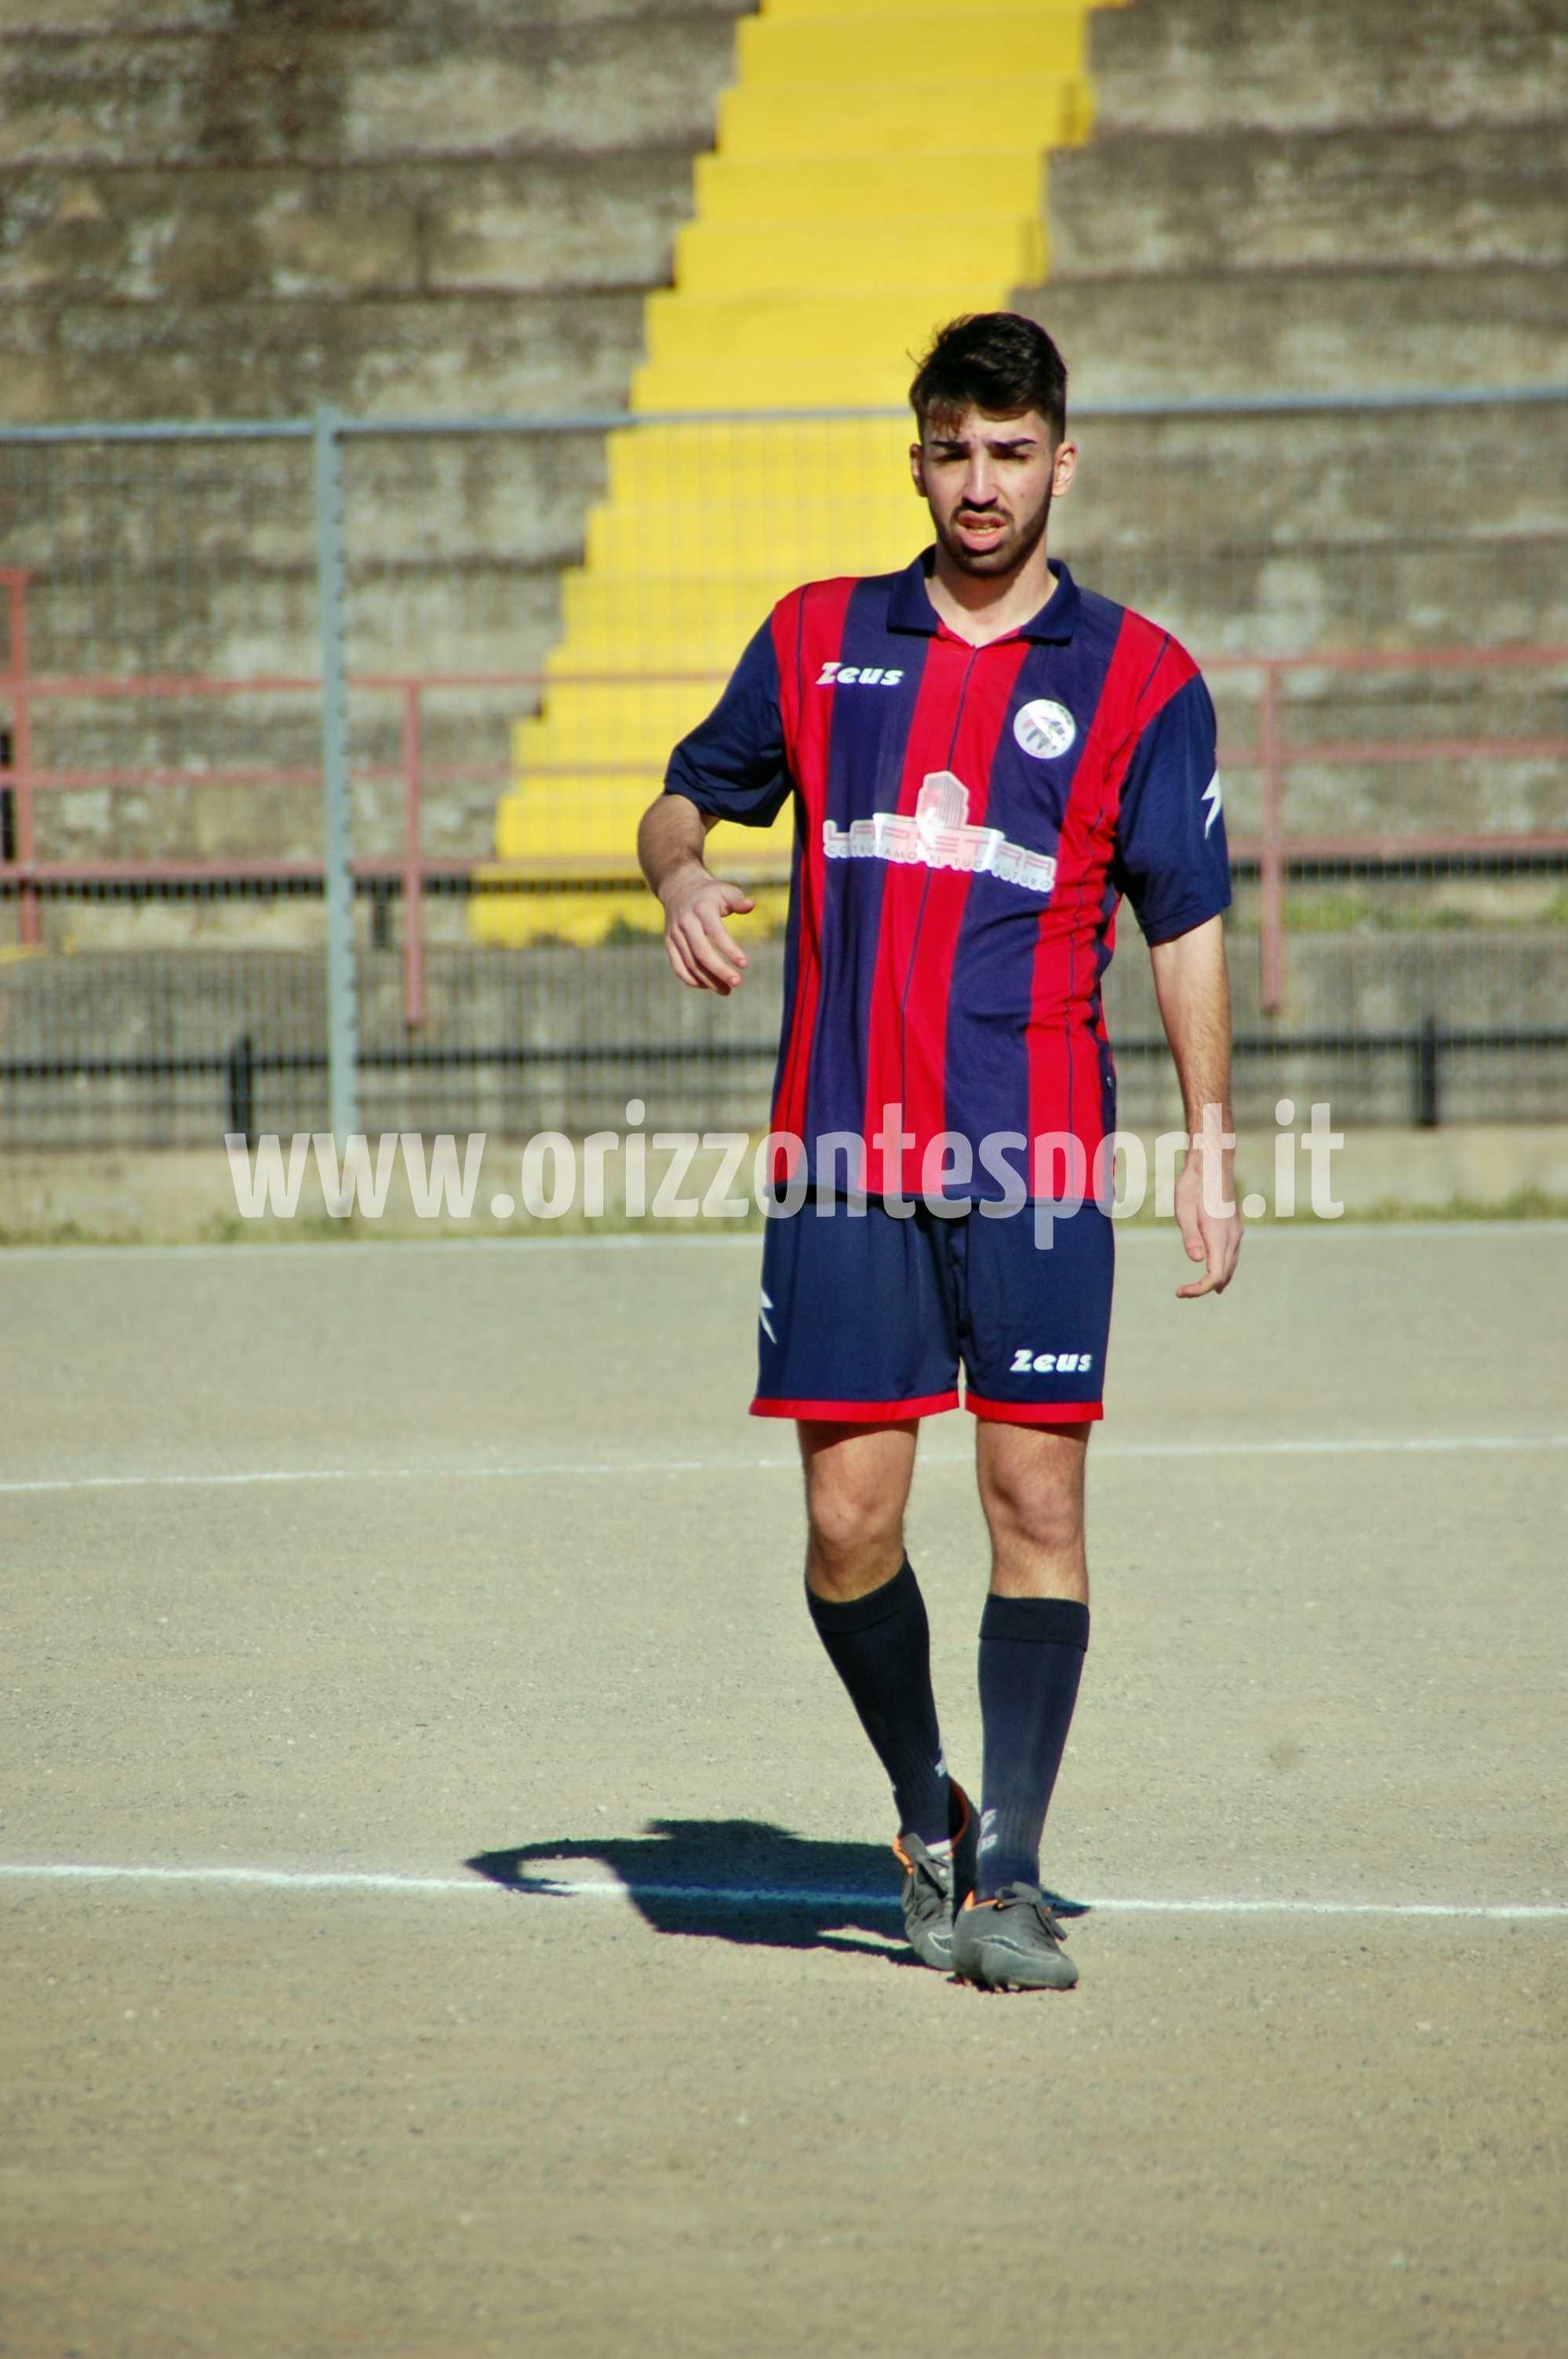 cassano_rossanese (39)